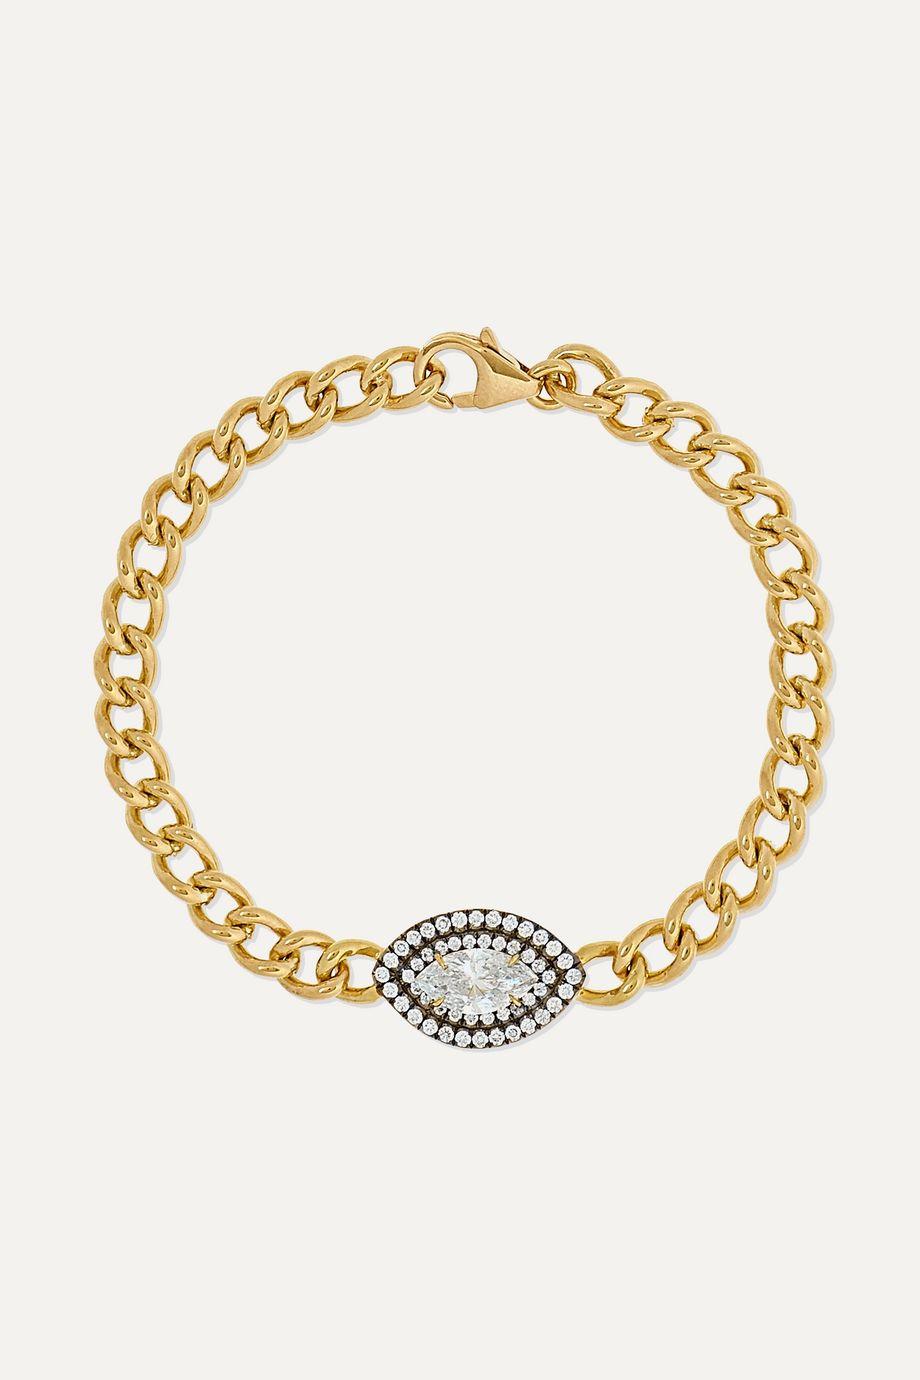 Jemma Wynne Toujours Armband aus 18 Karat Gold mit Diamanten